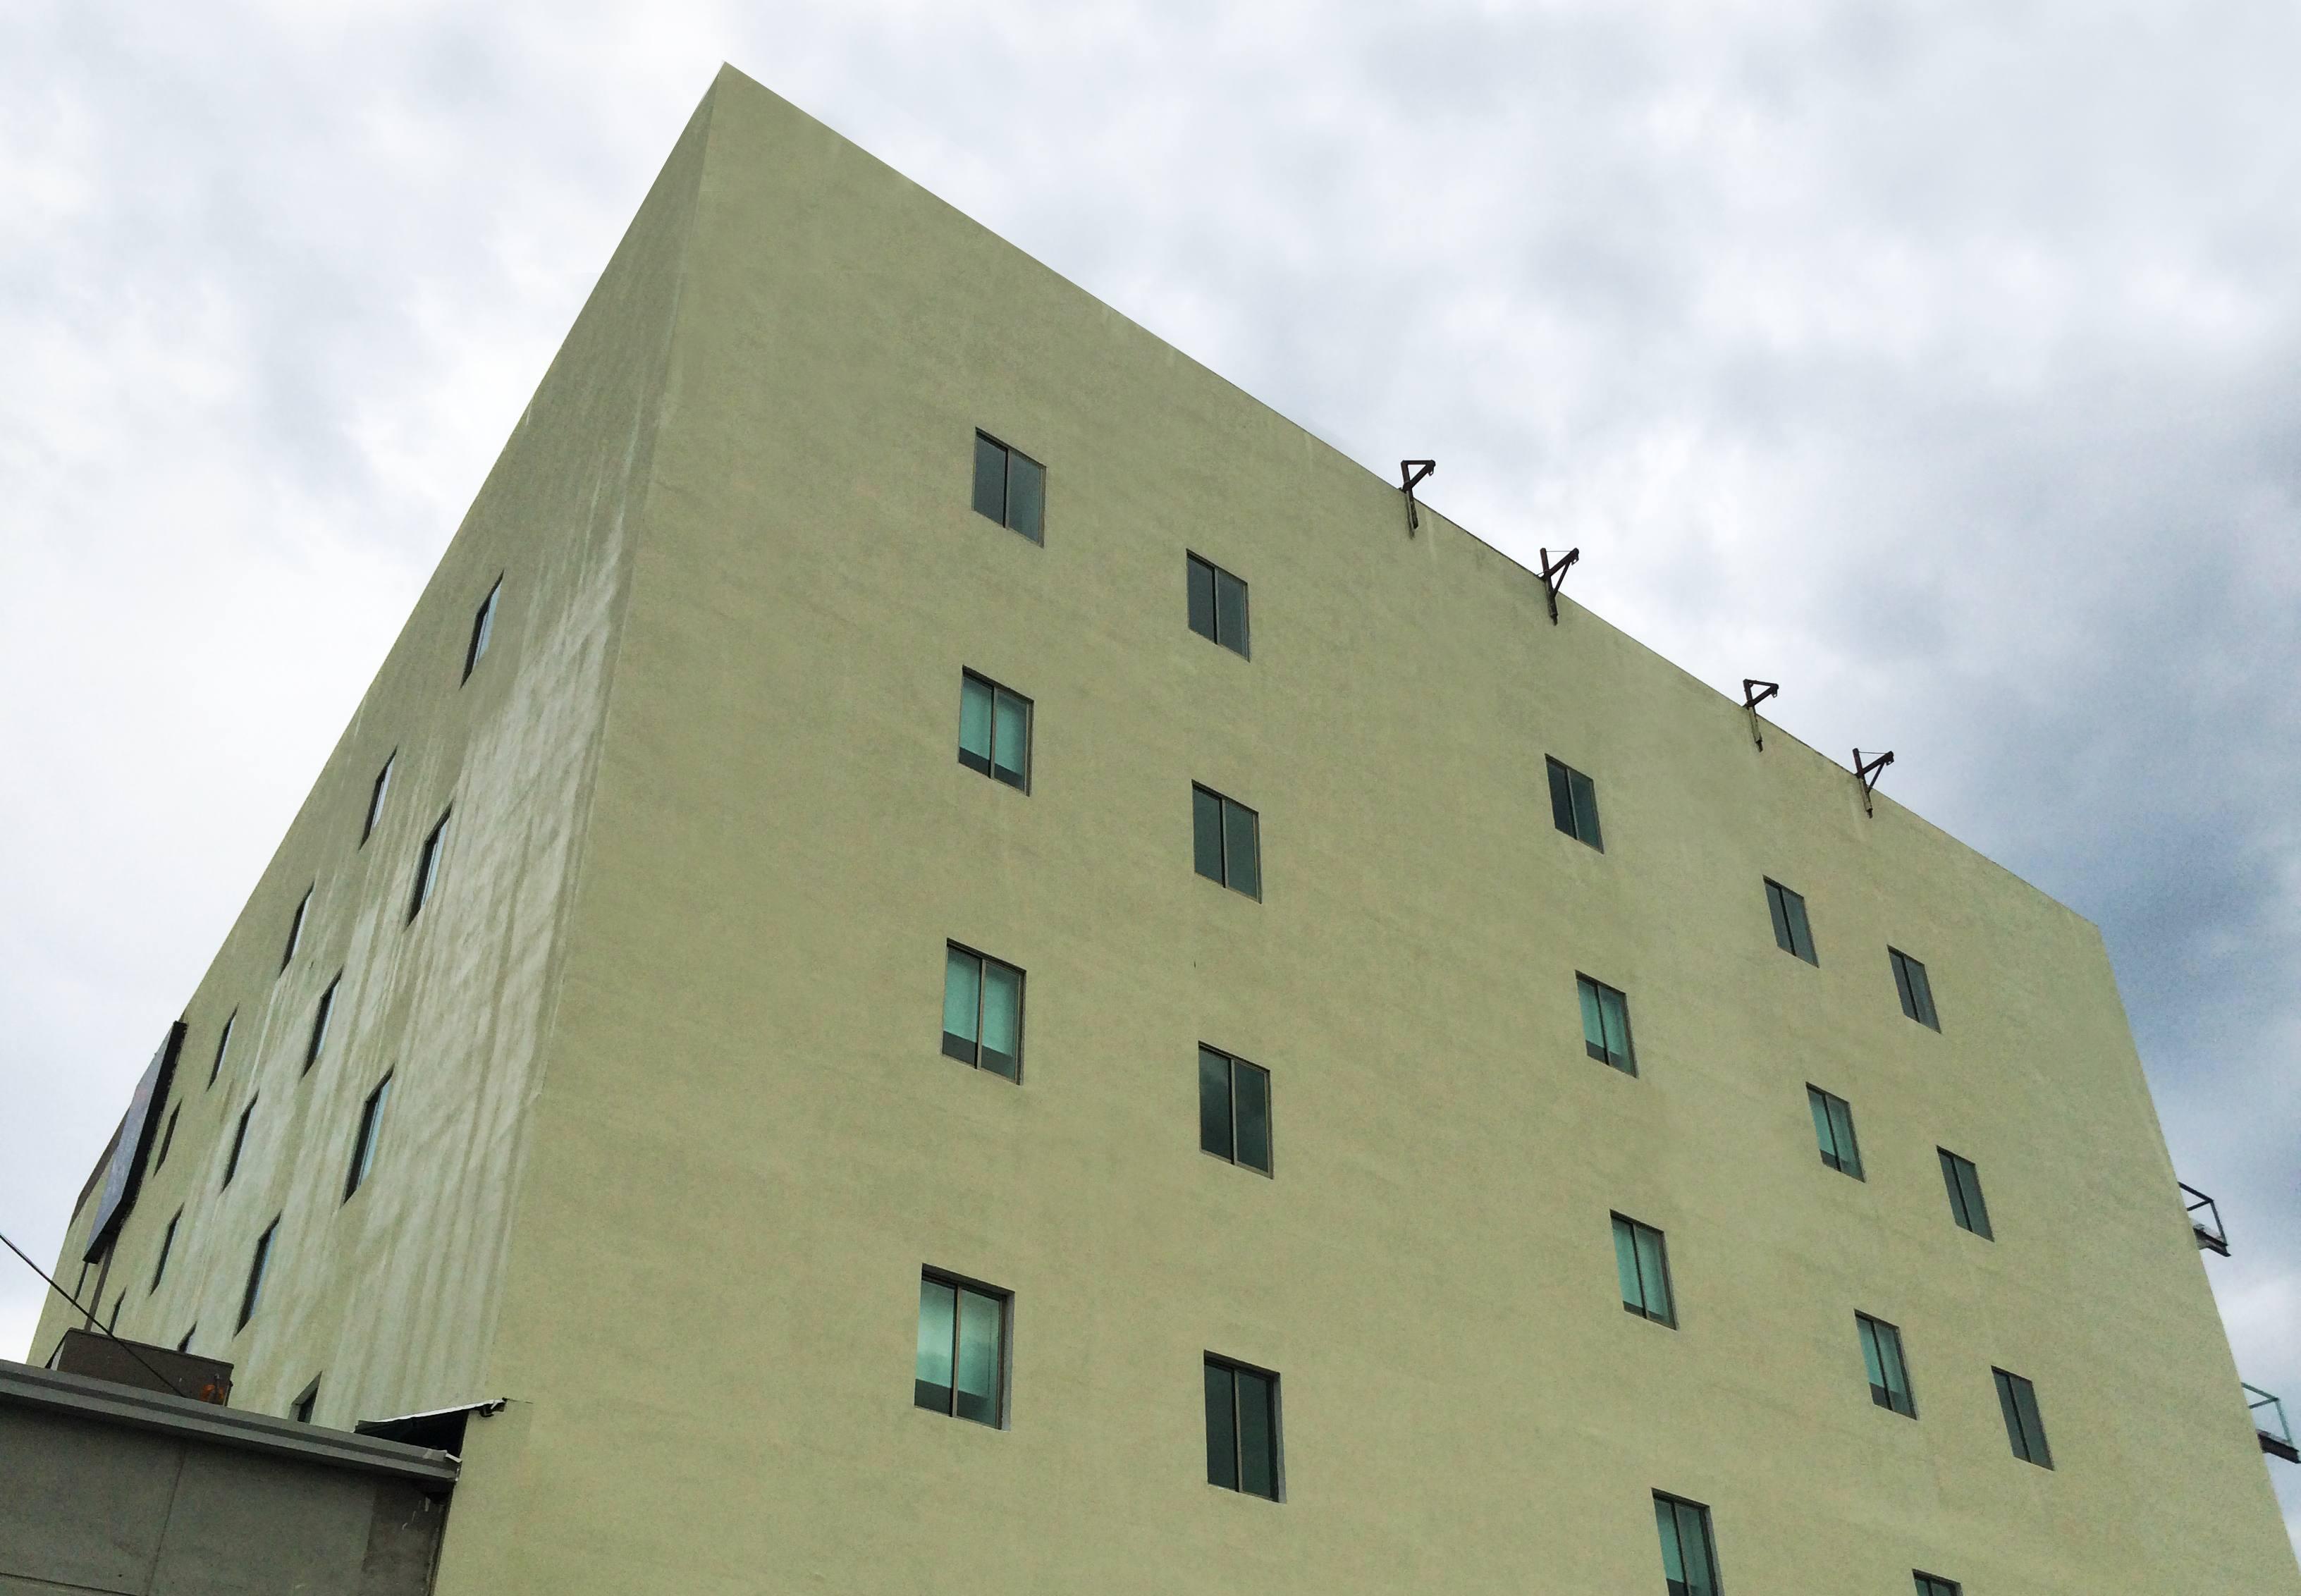 HOTEL SLEEP INN TUXTLA GUTIERREZ CHIAPAS